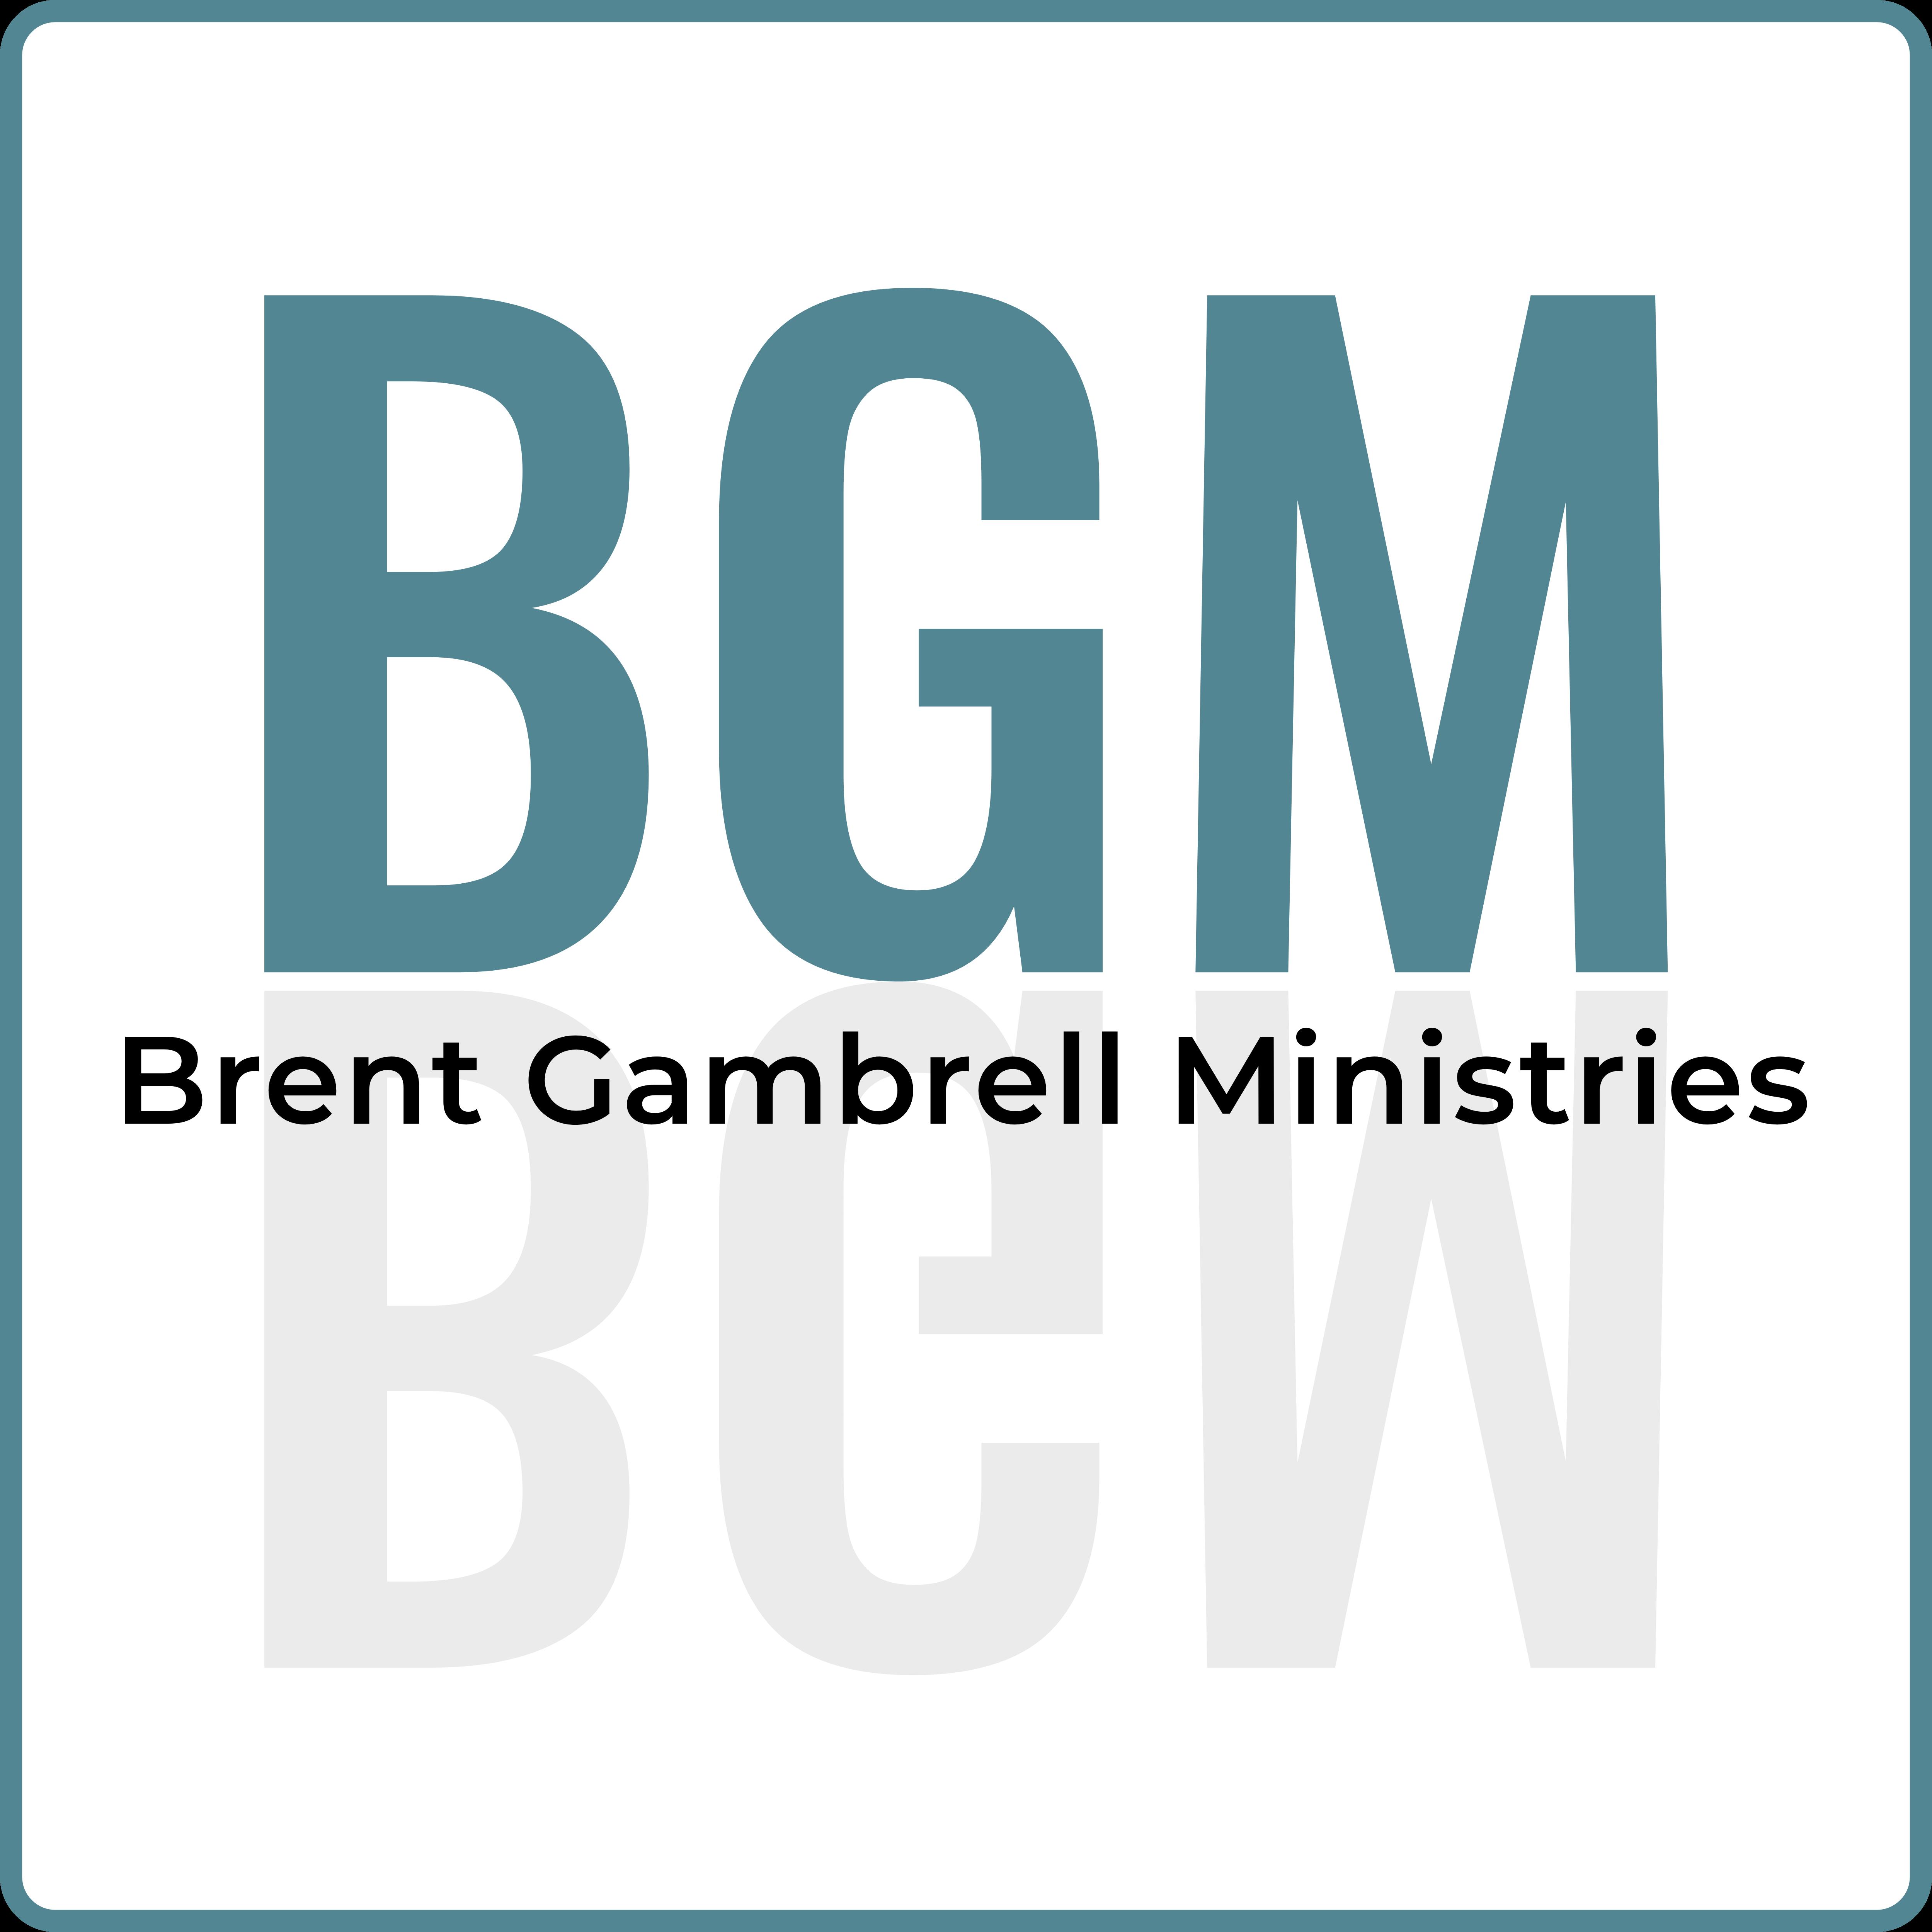 Brent Gambrell Ministries